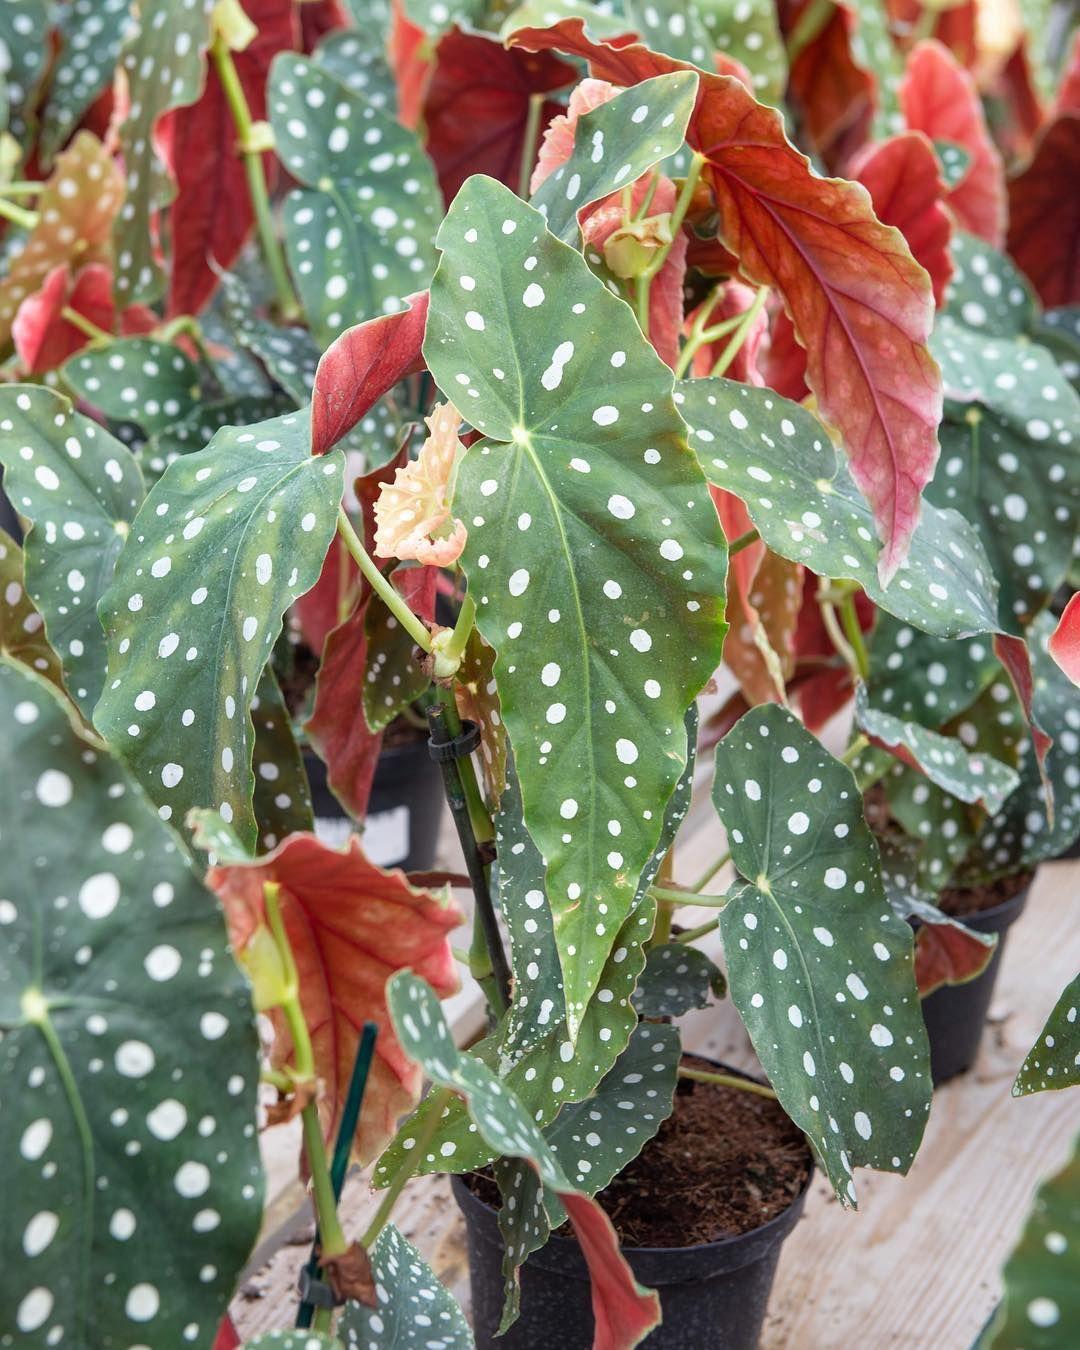 Begonia Maculata Showing Off Those Beautiful Spots Begonia Maculata Beautiful Spots Begonia